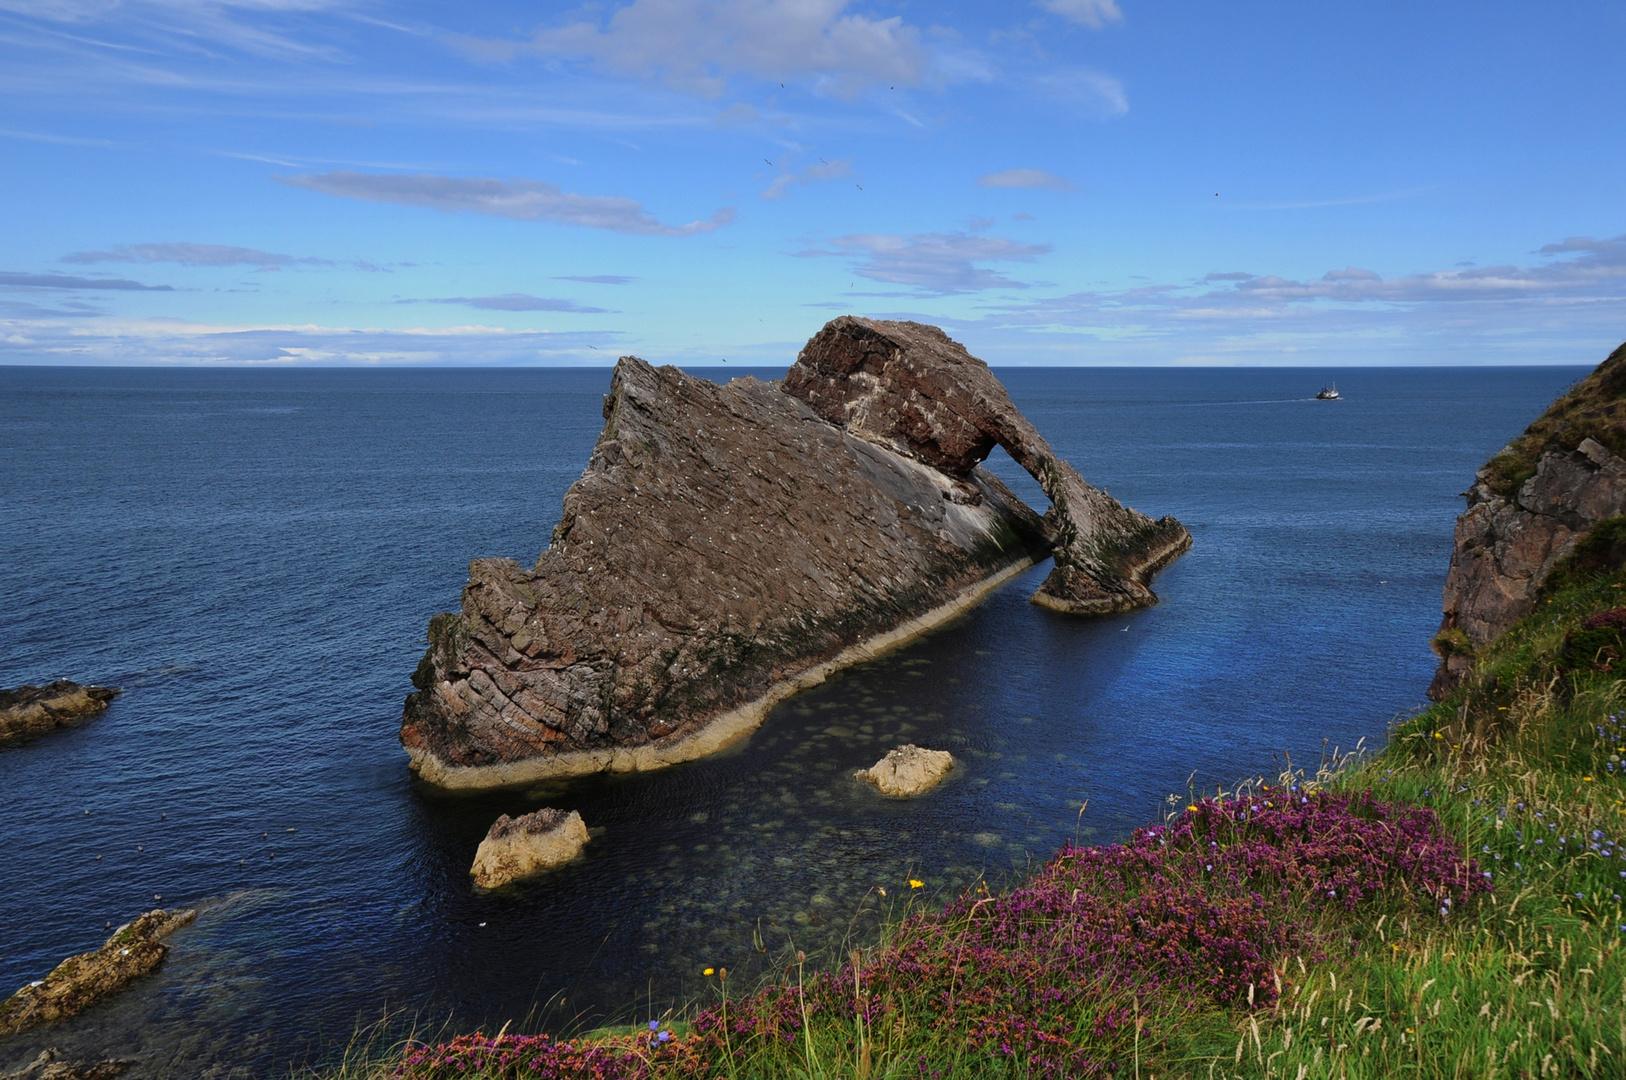 Bowfiddle Rock